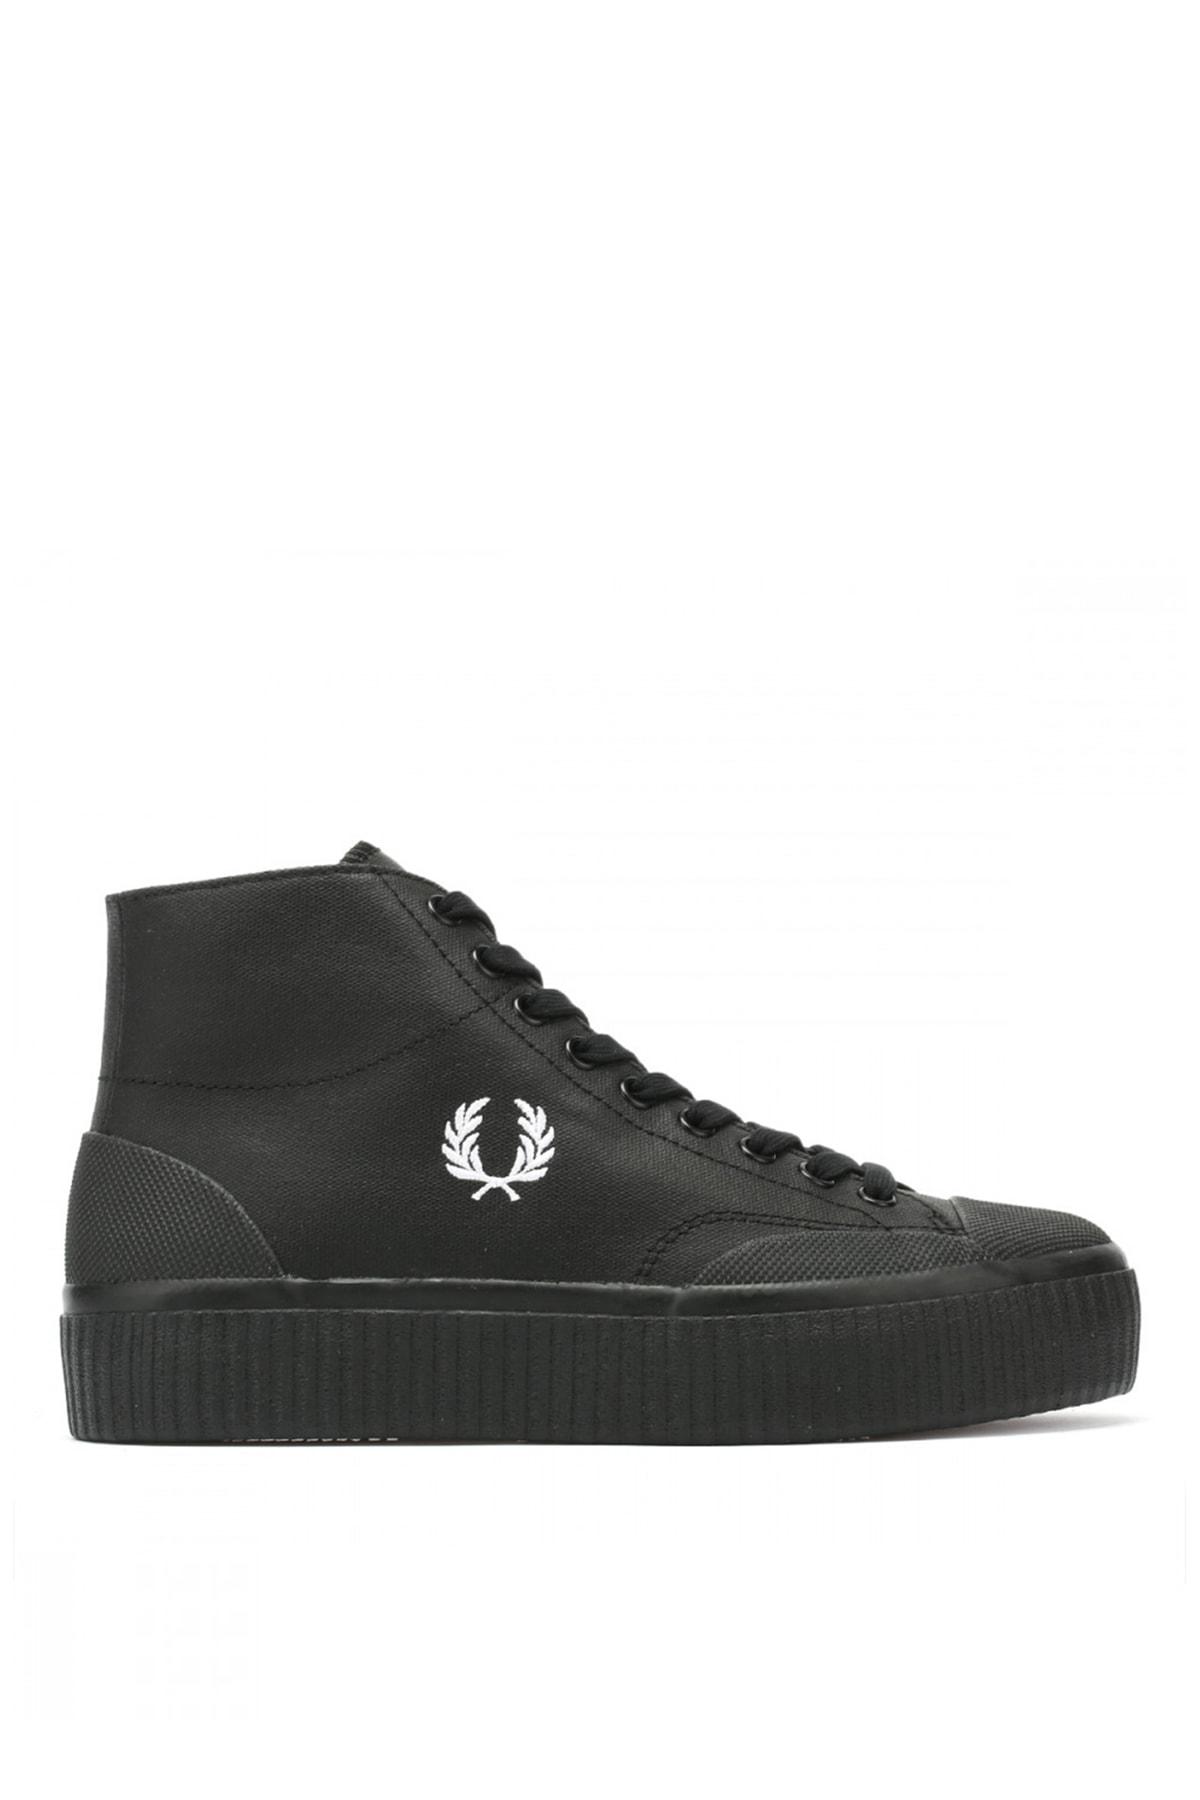 Fred Perry Kadın Siyah Sneaker 183FRPKAYB4330_F102 1